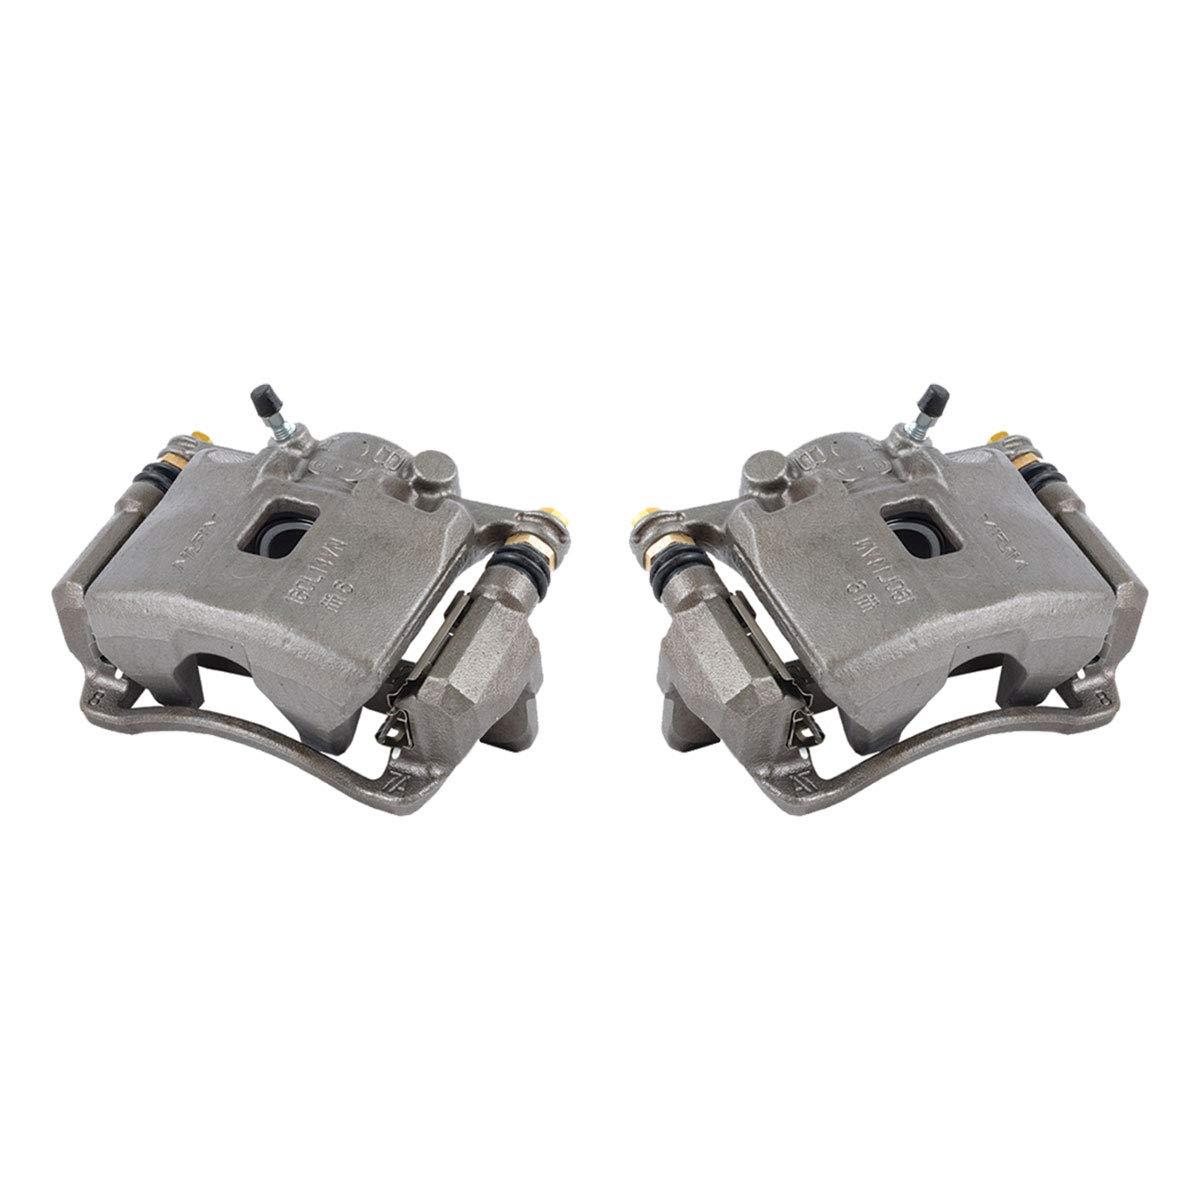 2 FRONT Premium Grade OE Semi-Loaded Caliper Assembly Pair Set CKOE00949